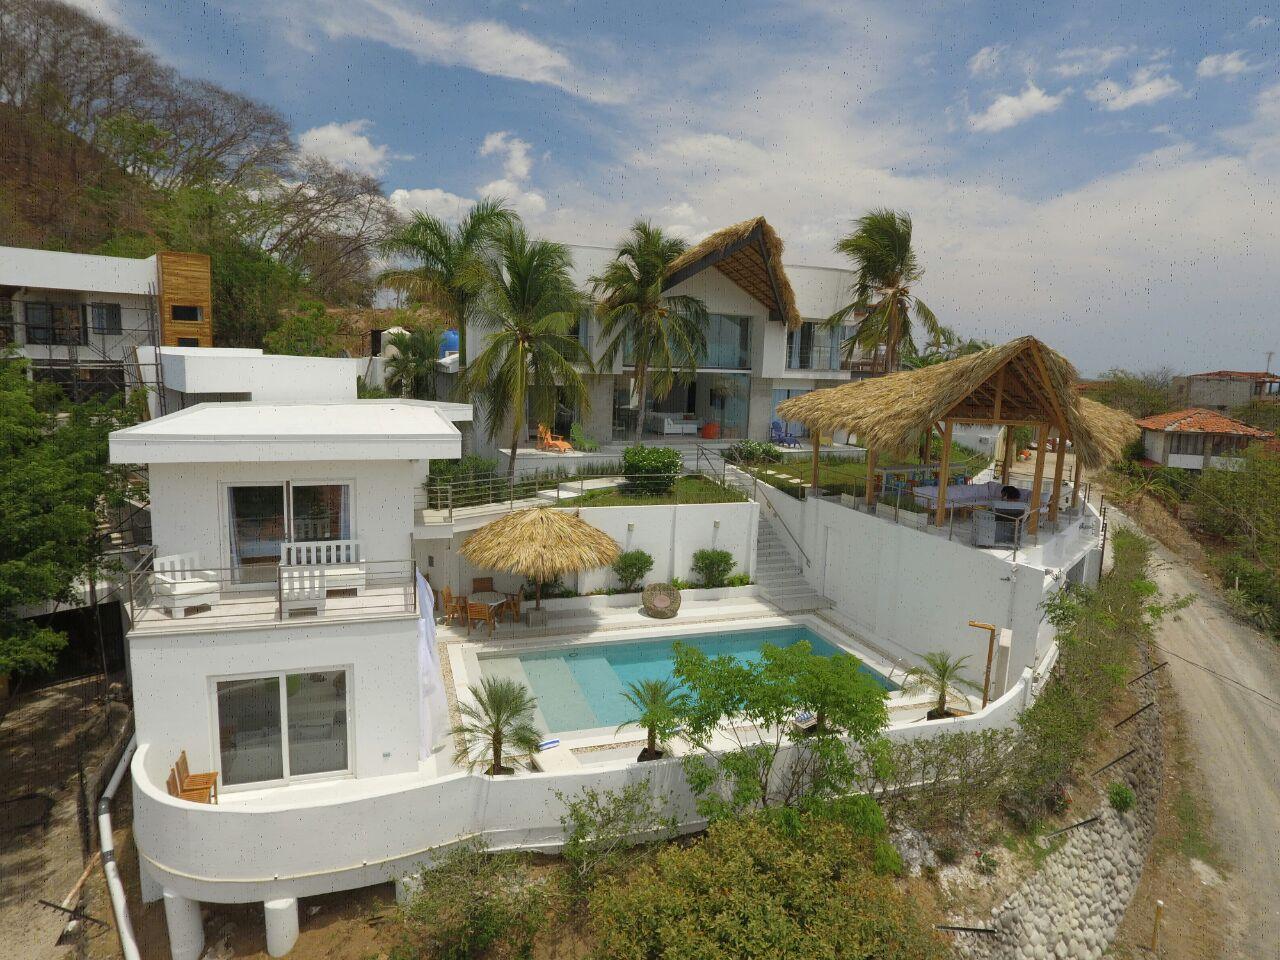 Casa Ilios from a bird's eye view